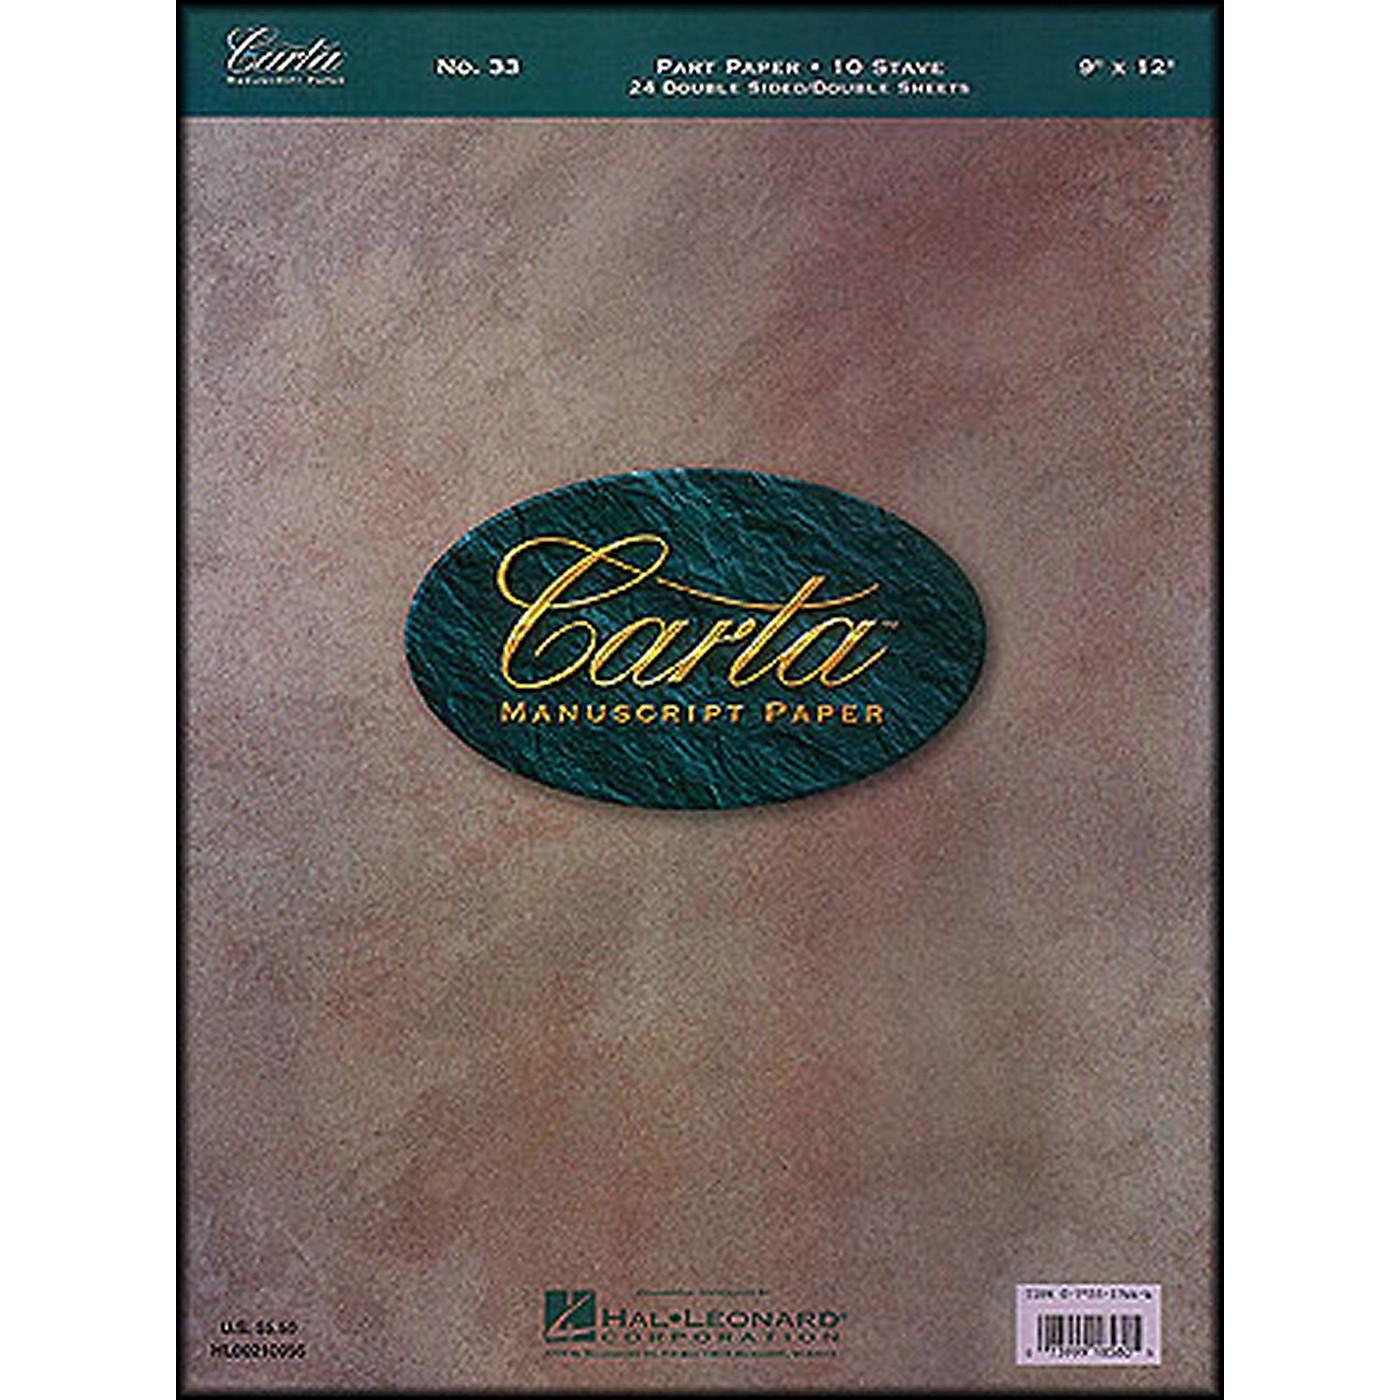 Hal Leonard Carta Manuscript 33 Part Paper 9 X 12, Double Sheets, Double Sided, 24 Sheets,10 Staves thumbnail